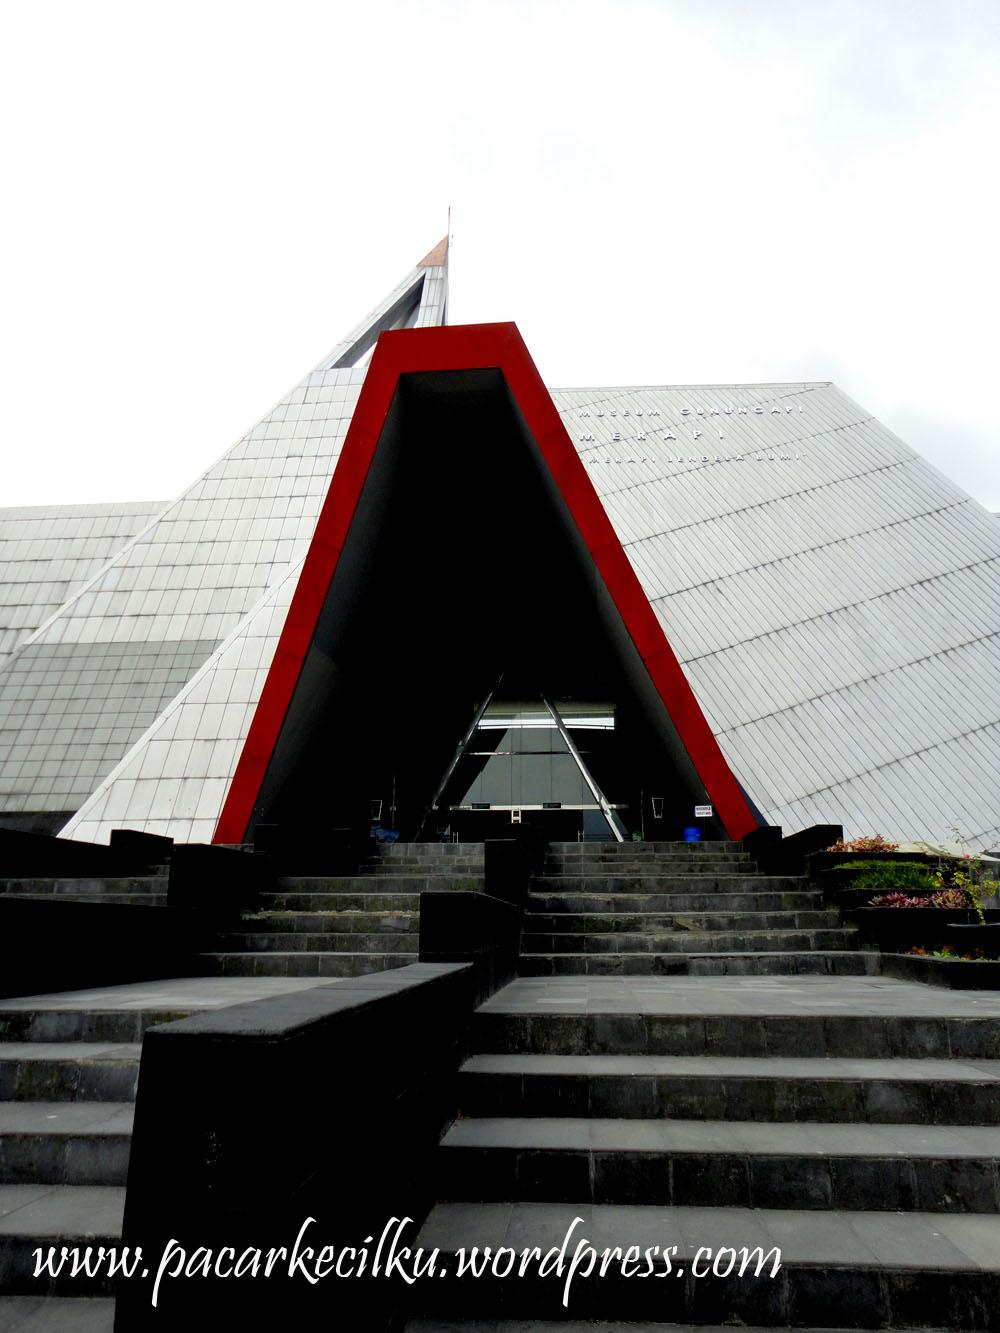 September 2011 Pacarkecilku